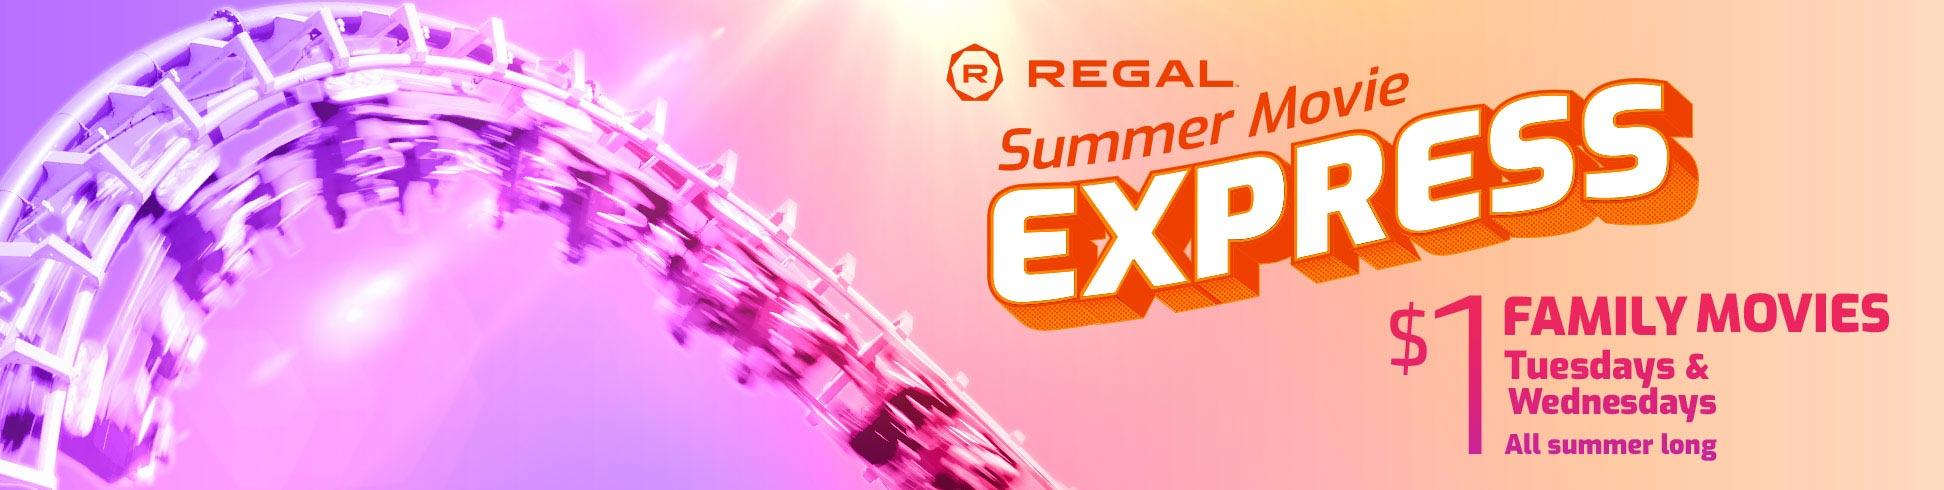 Regal summer-movie-express